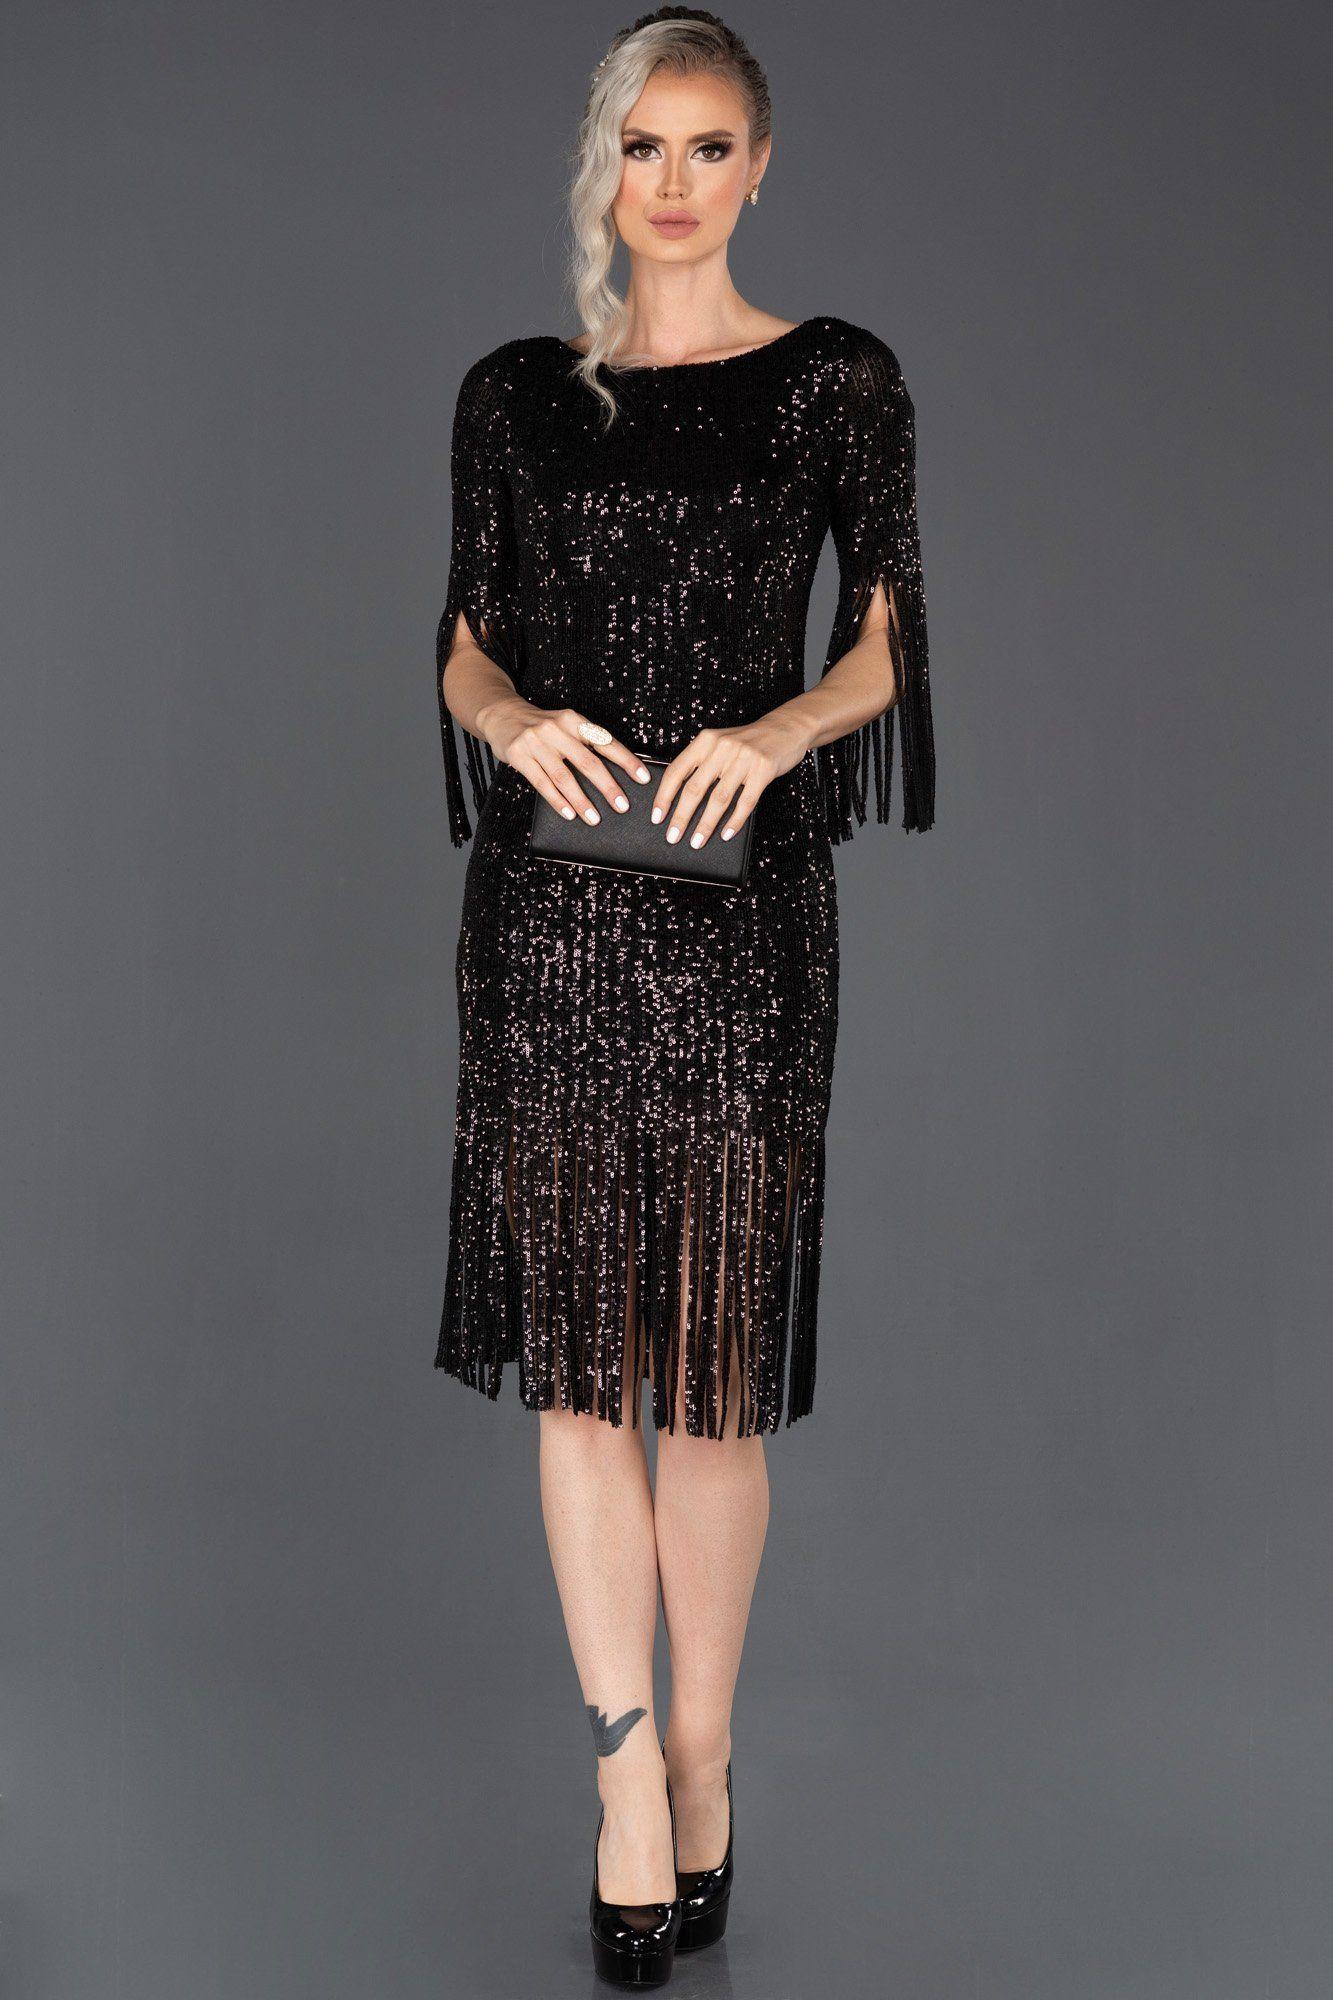 Siyah Kisa Puskullu Pul Payetli Davet Elbisesi Abk670 The Dress Elbise Moda Stilleri